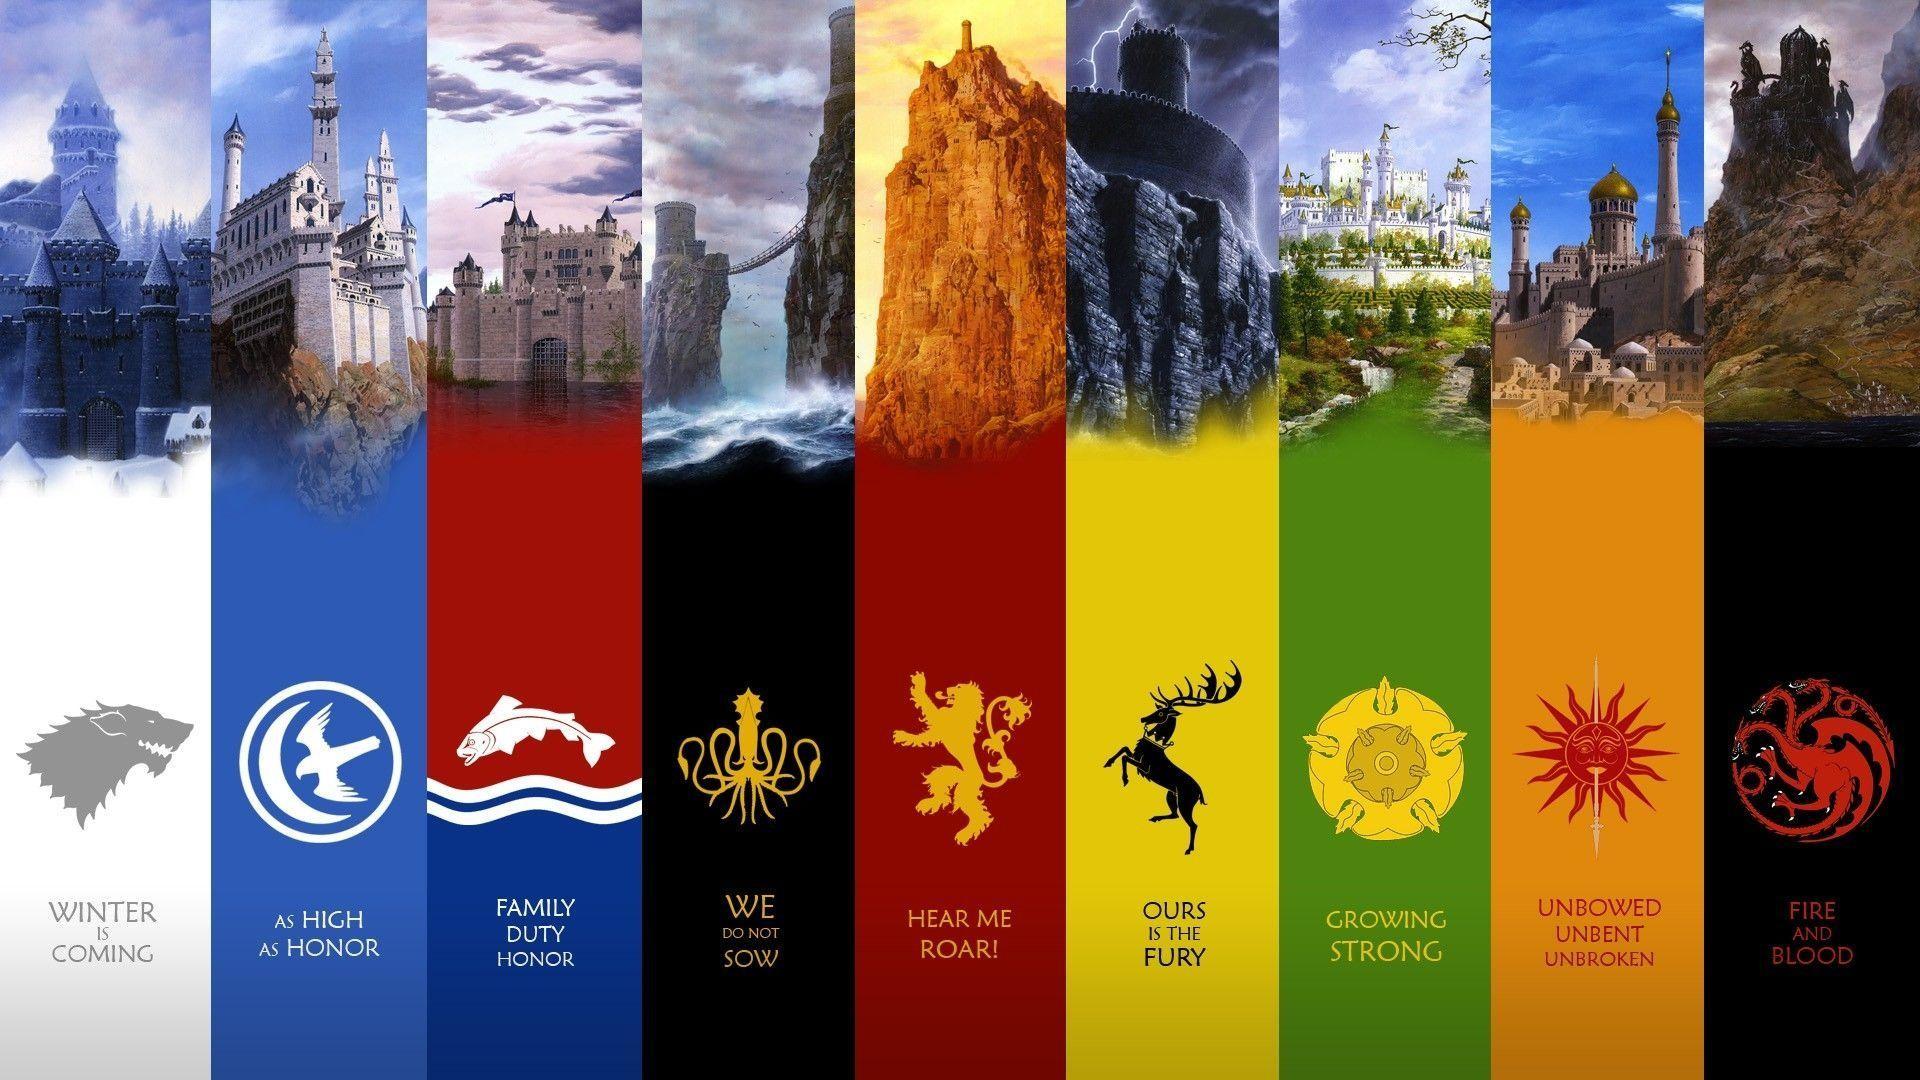 House Baratheon Iphone Wallpaper | Gallery